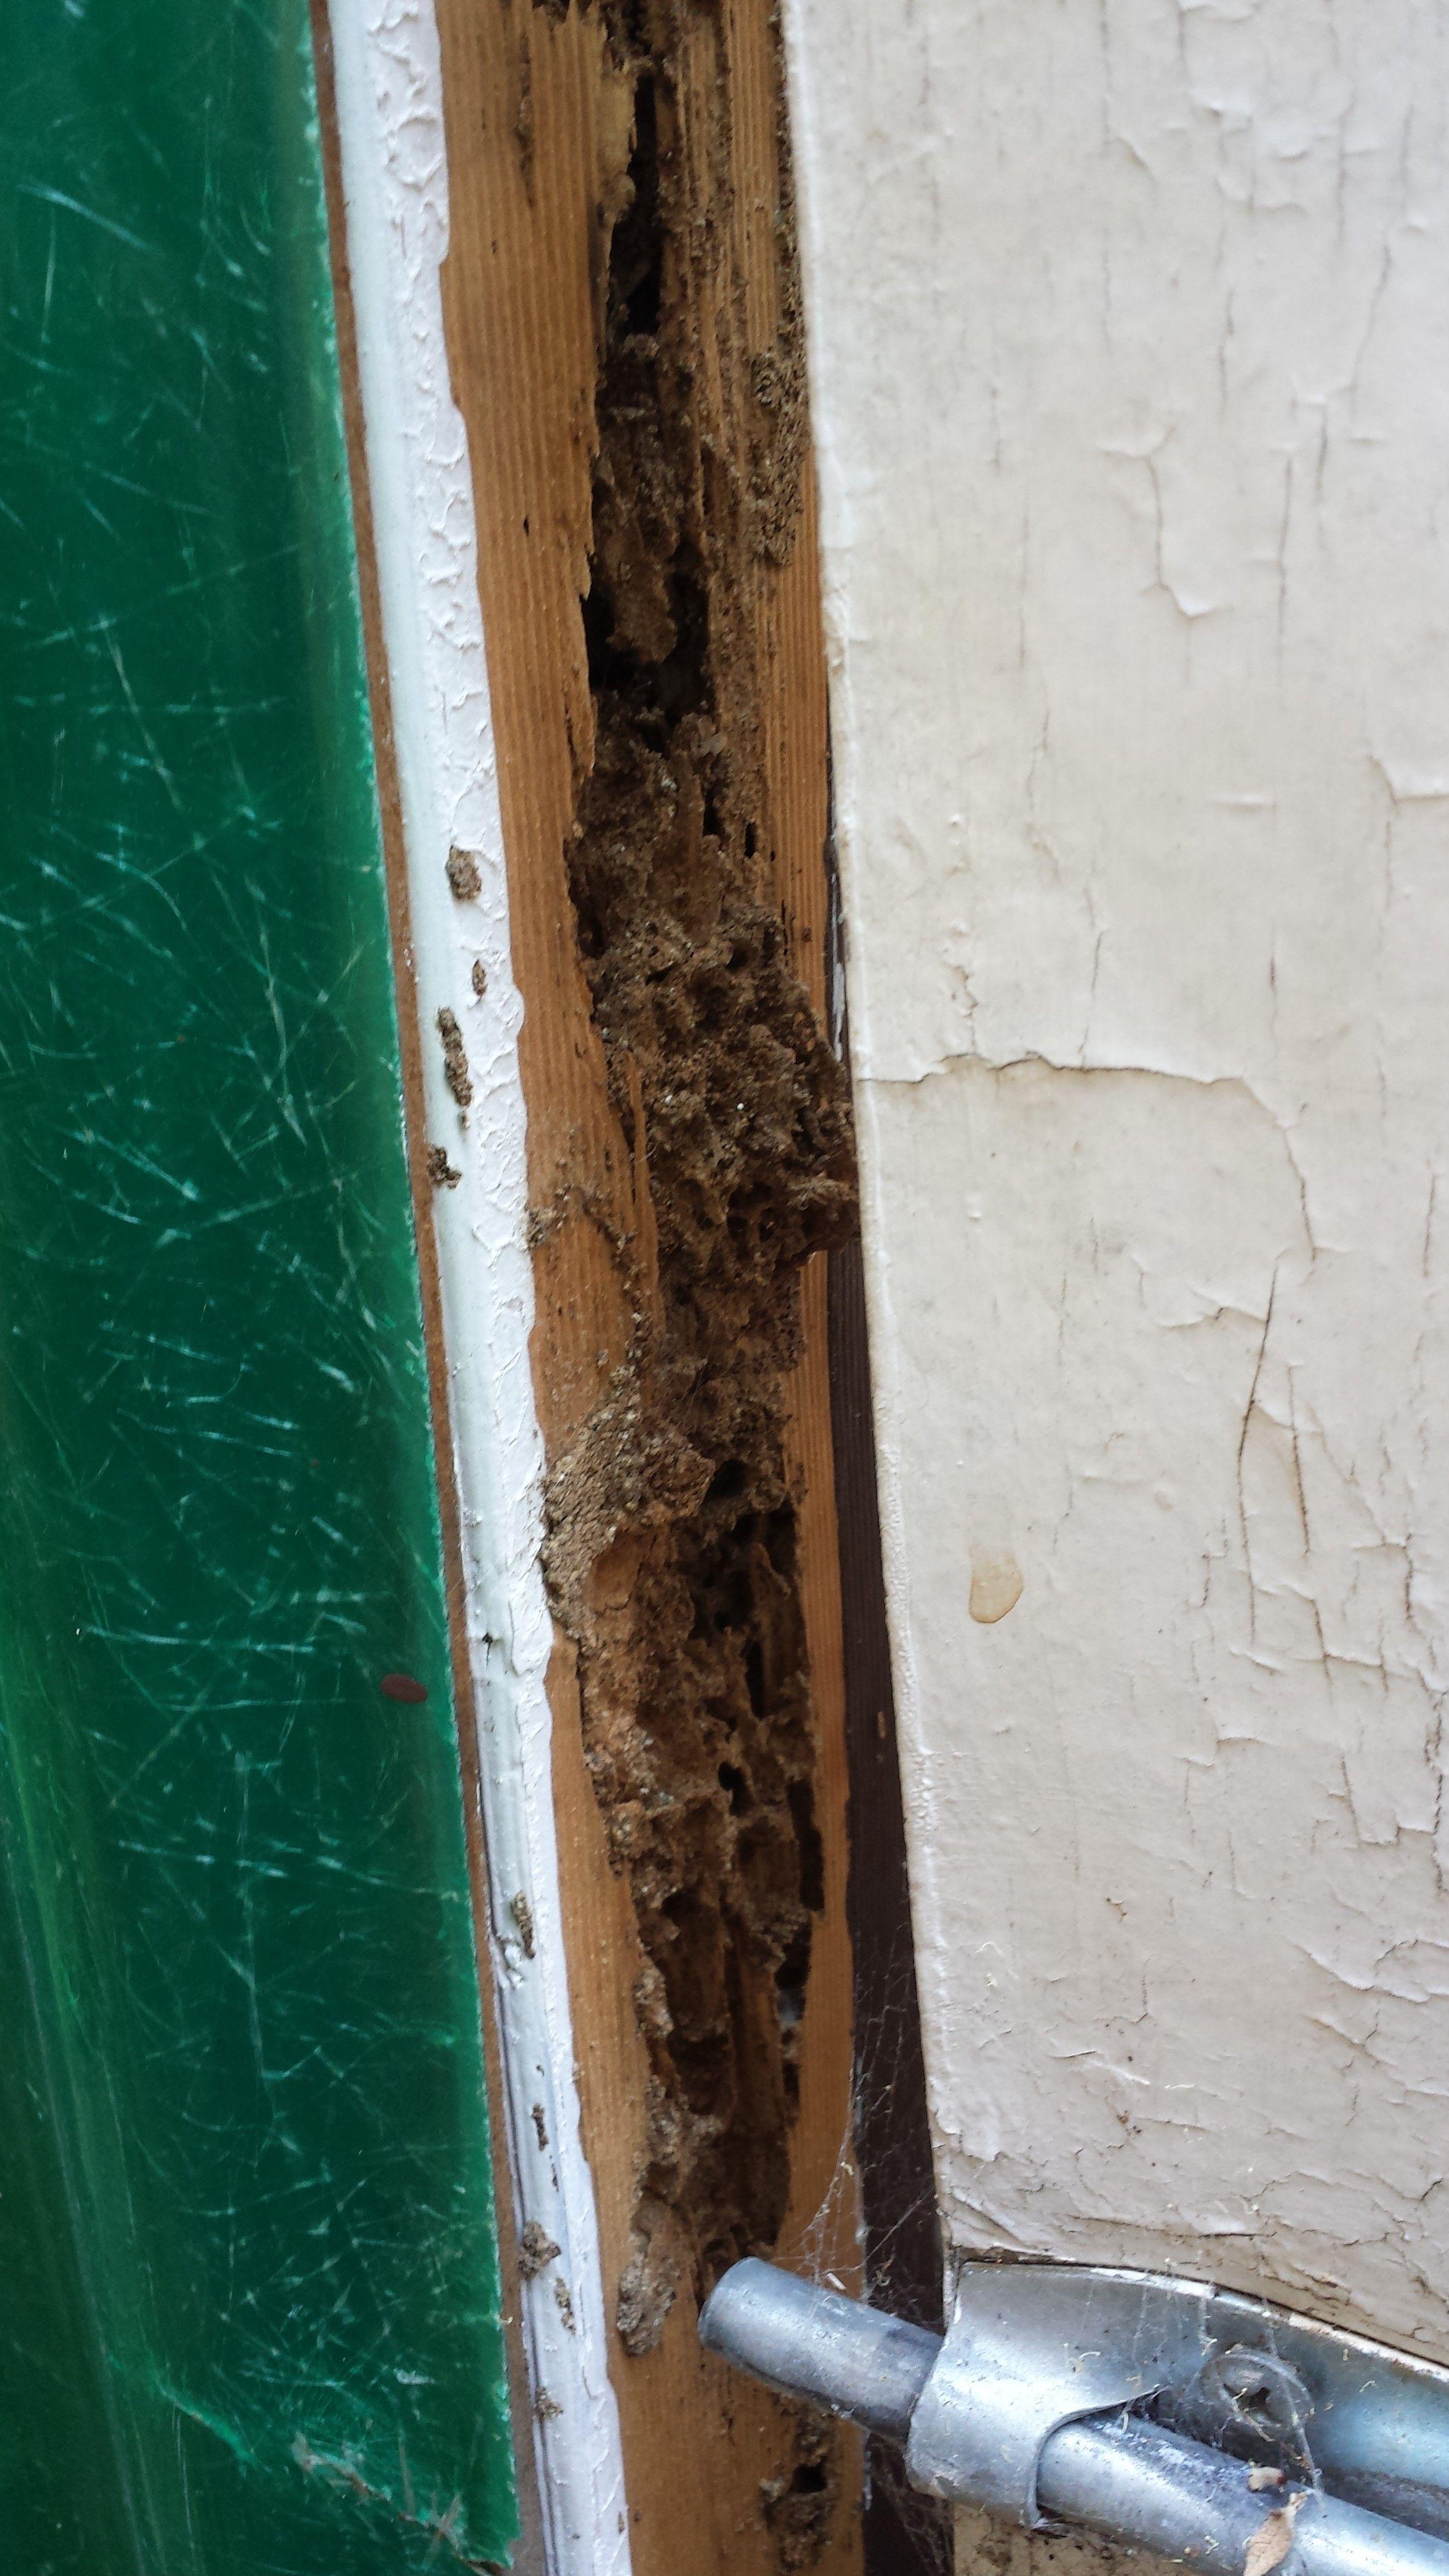 termites in door frame | Allframes5.org